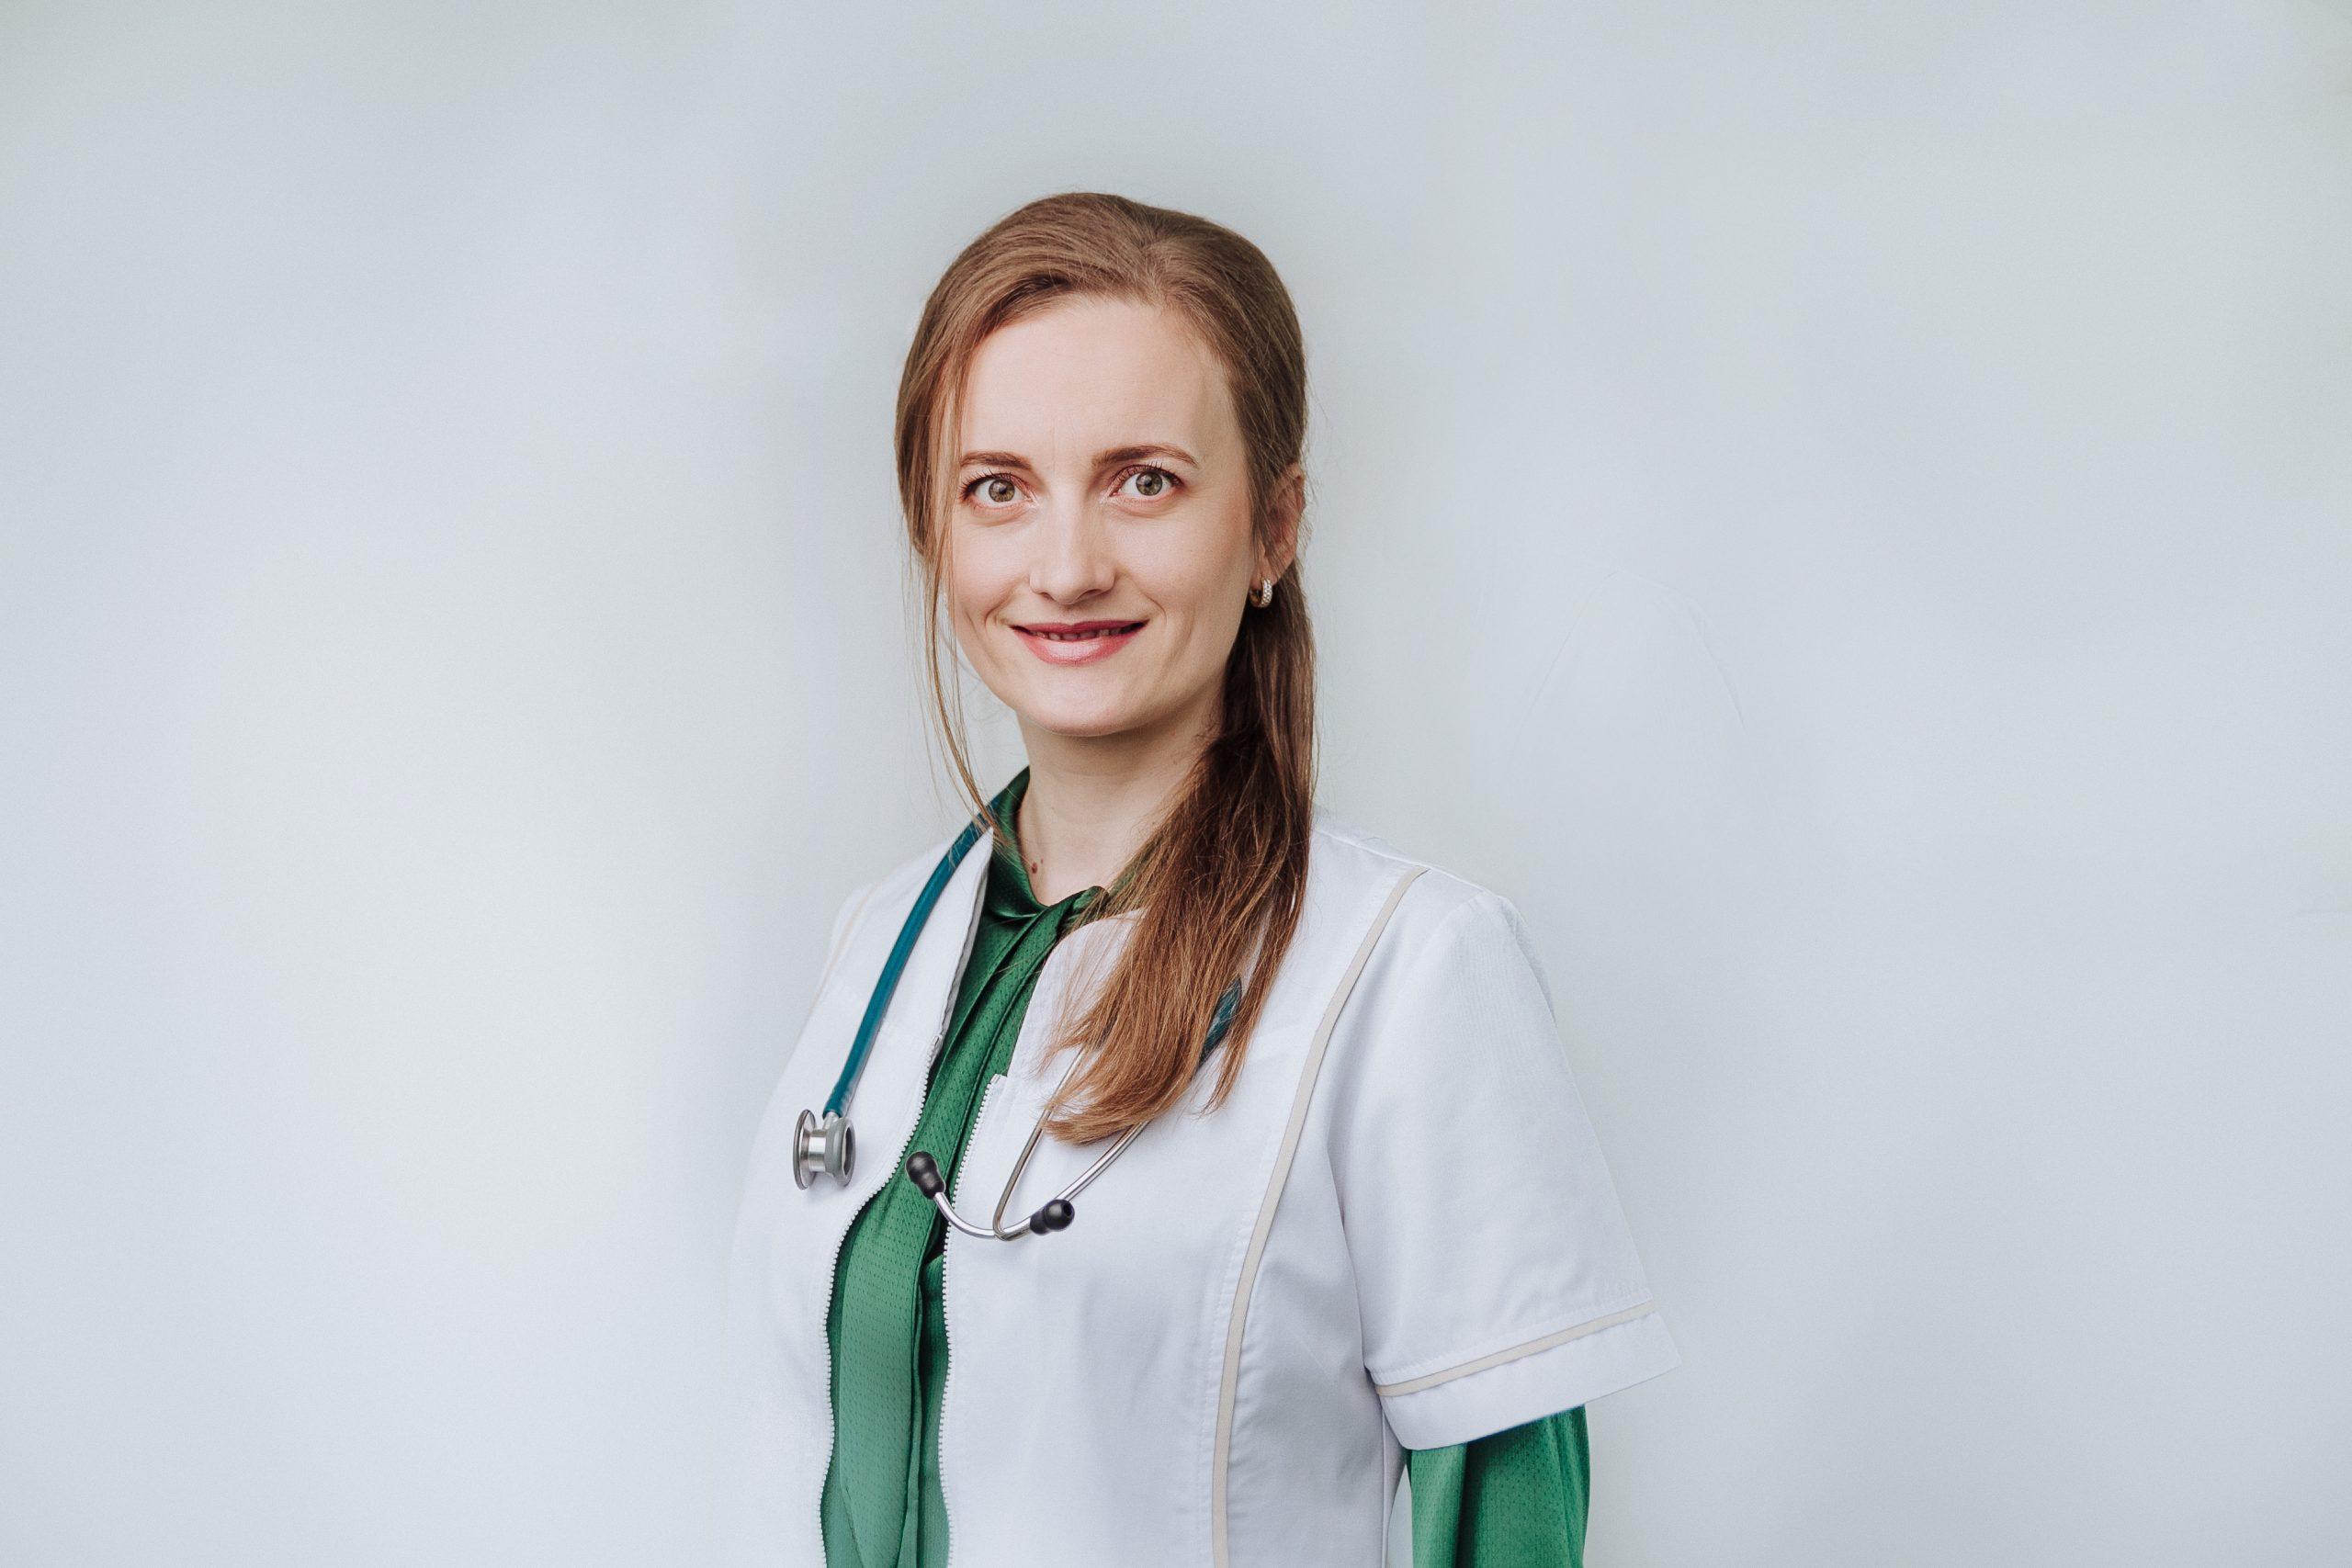 Dr. Ioana Măguran